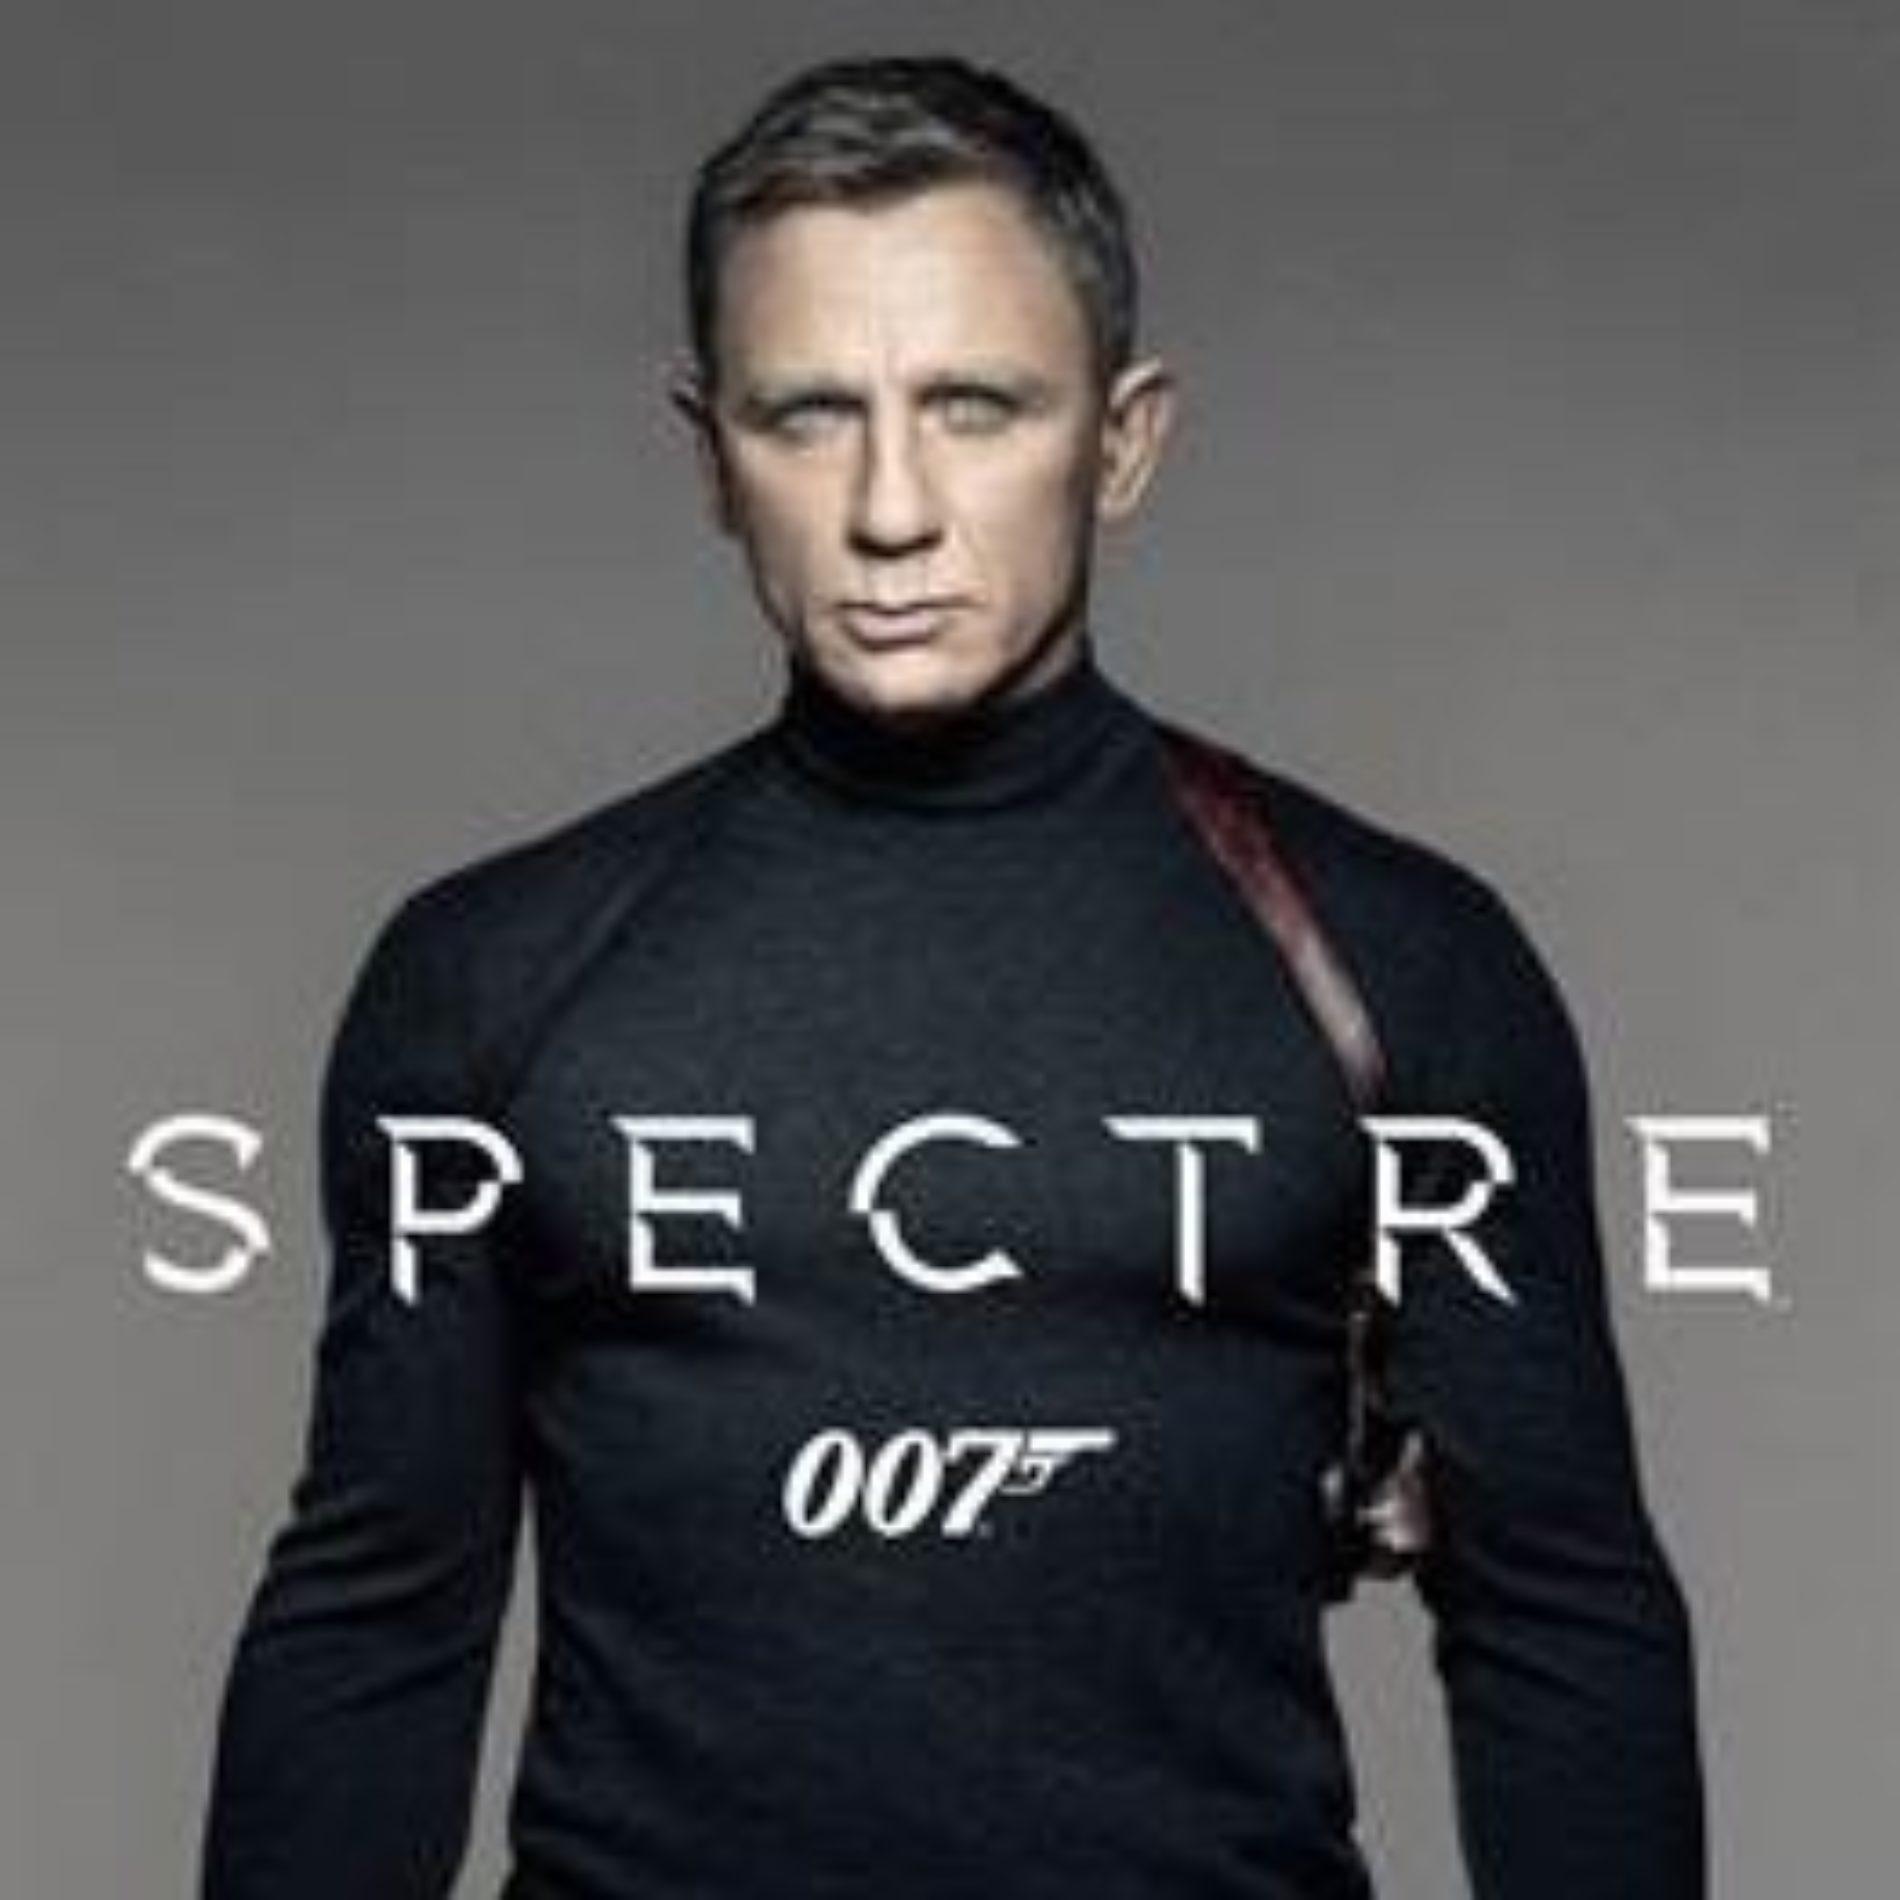 OTRO ADELANTO DE 007 SPECTRE